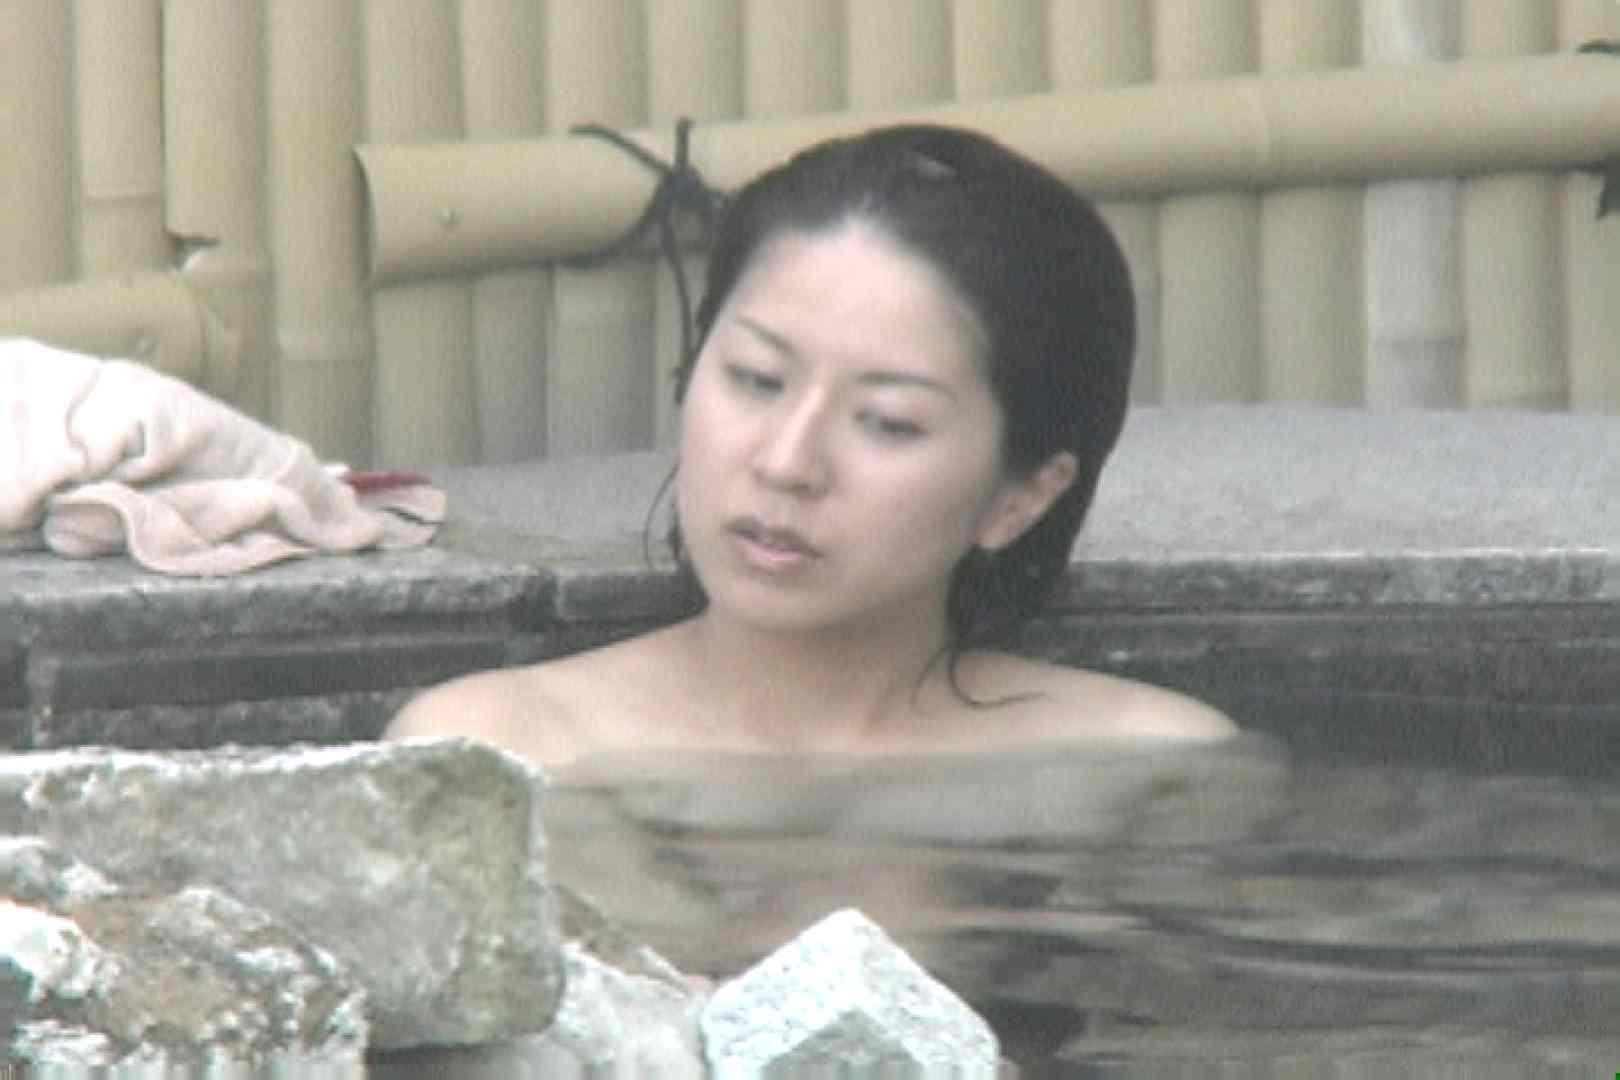 Aquaな露天風呂Vol.694 露天 オメコ無修正動画無料 110PICs 98